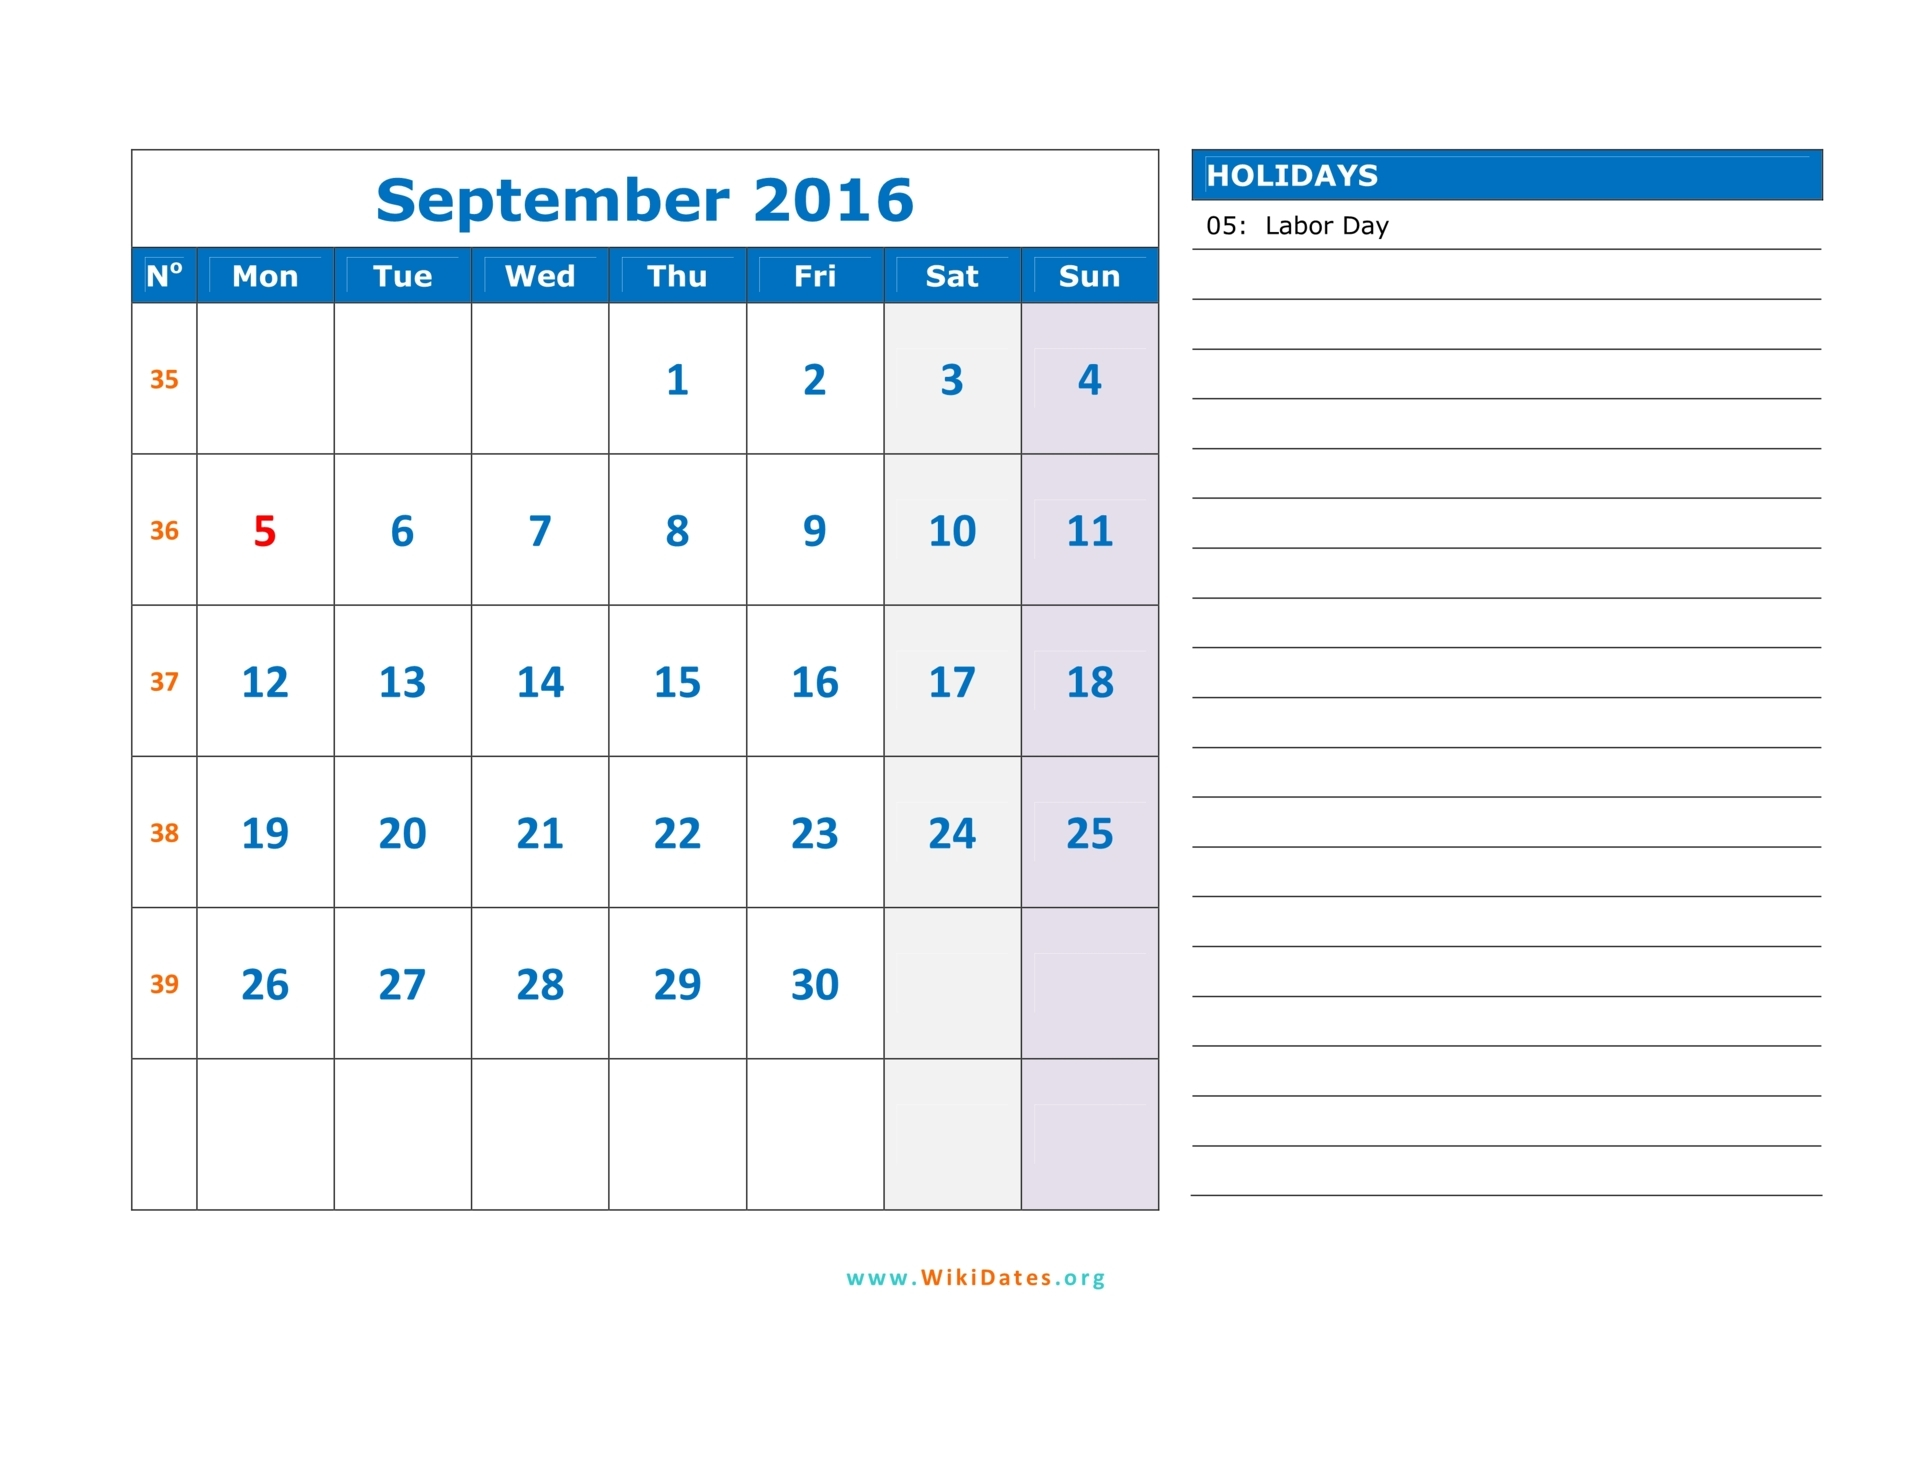 September 2016 Calendar   WikiDates.org